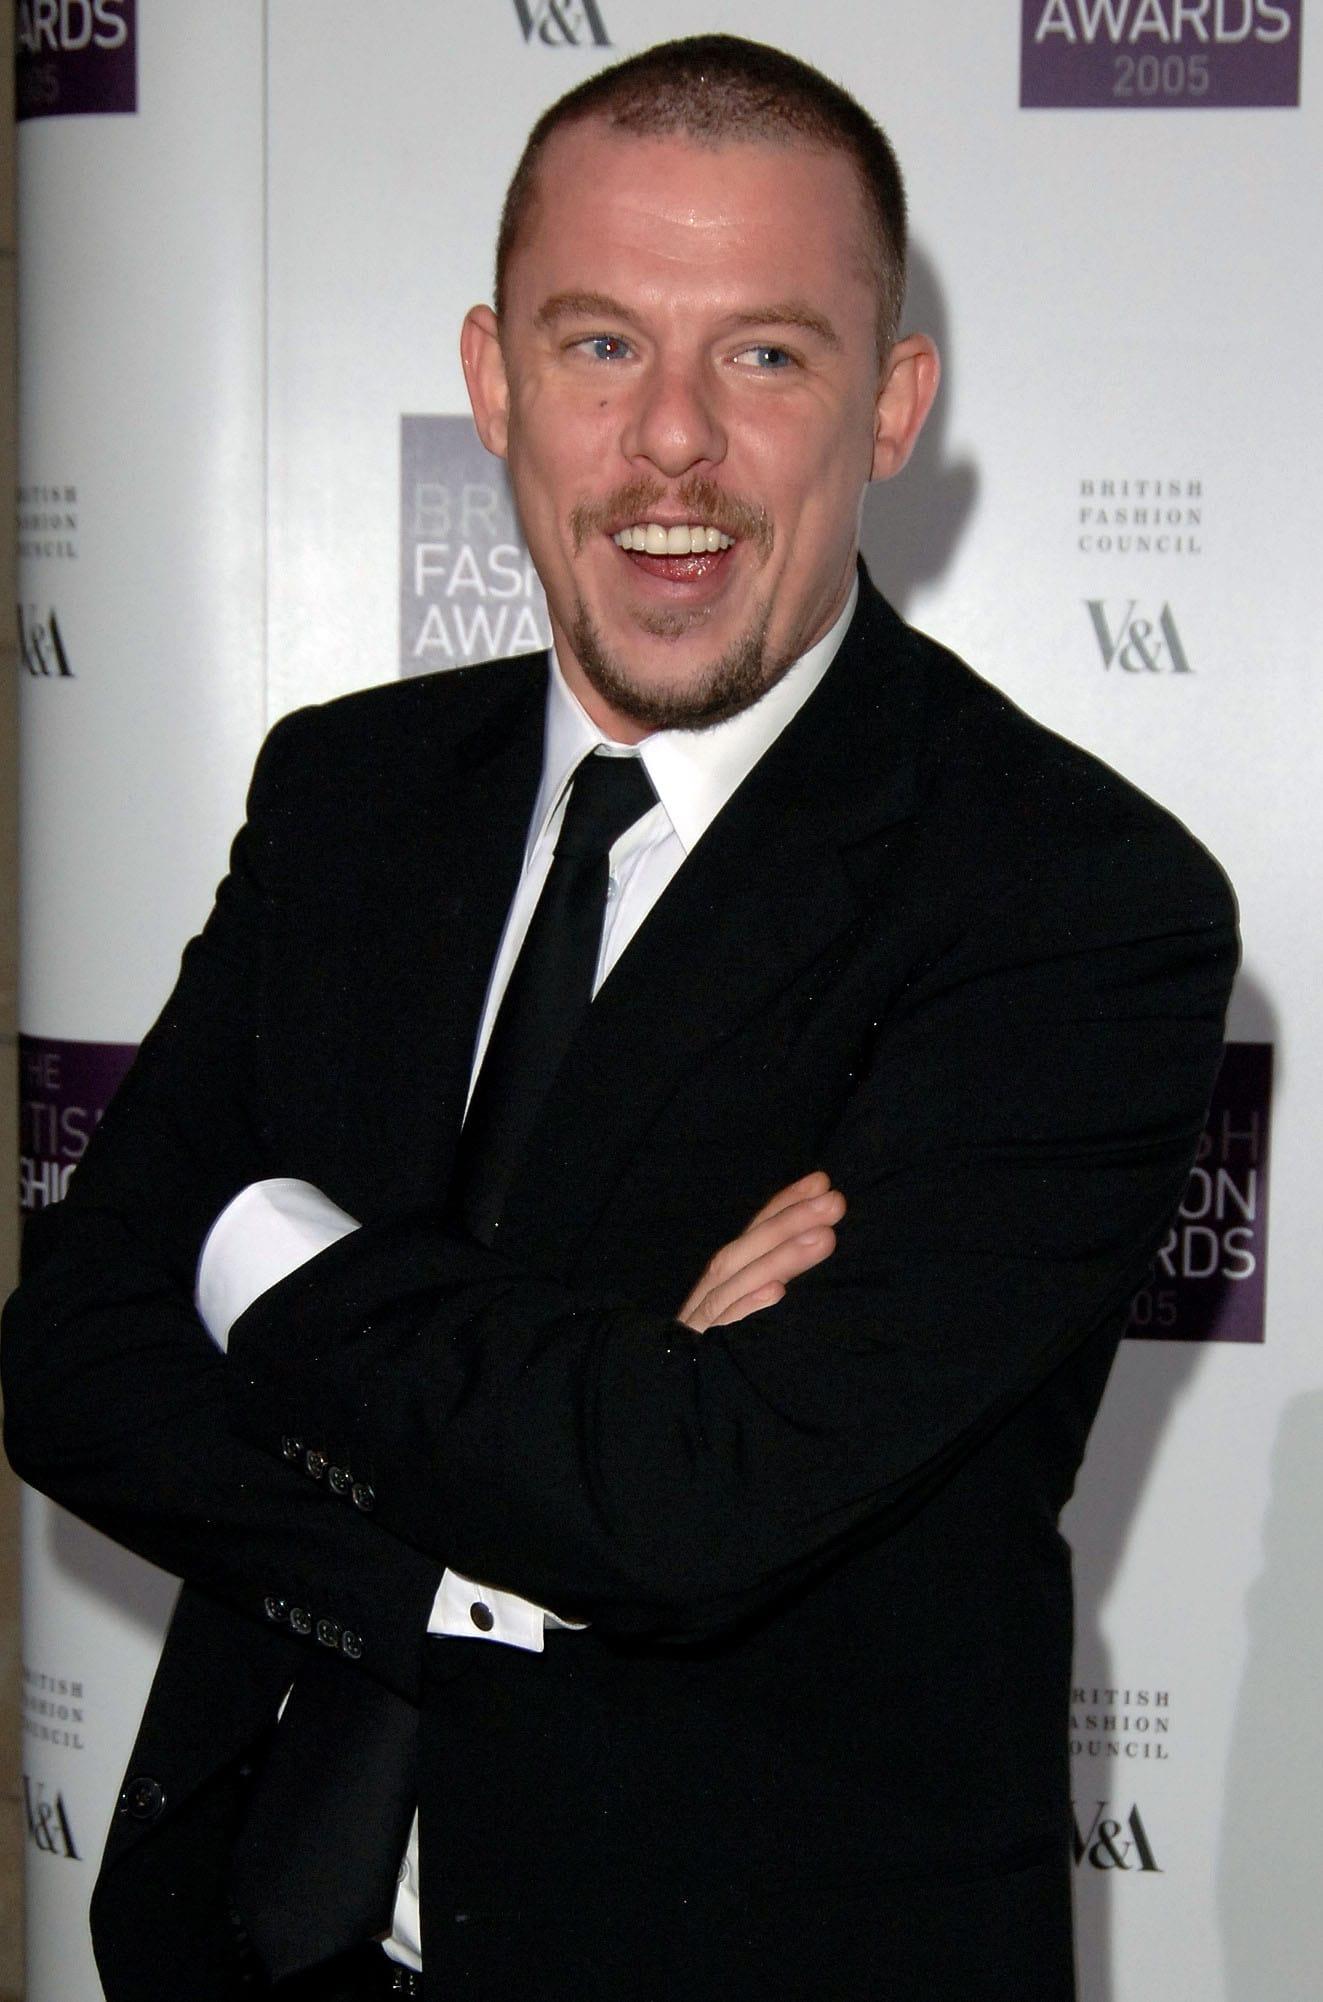 Alexander McQueen at the British Fashion Awards in November 2005